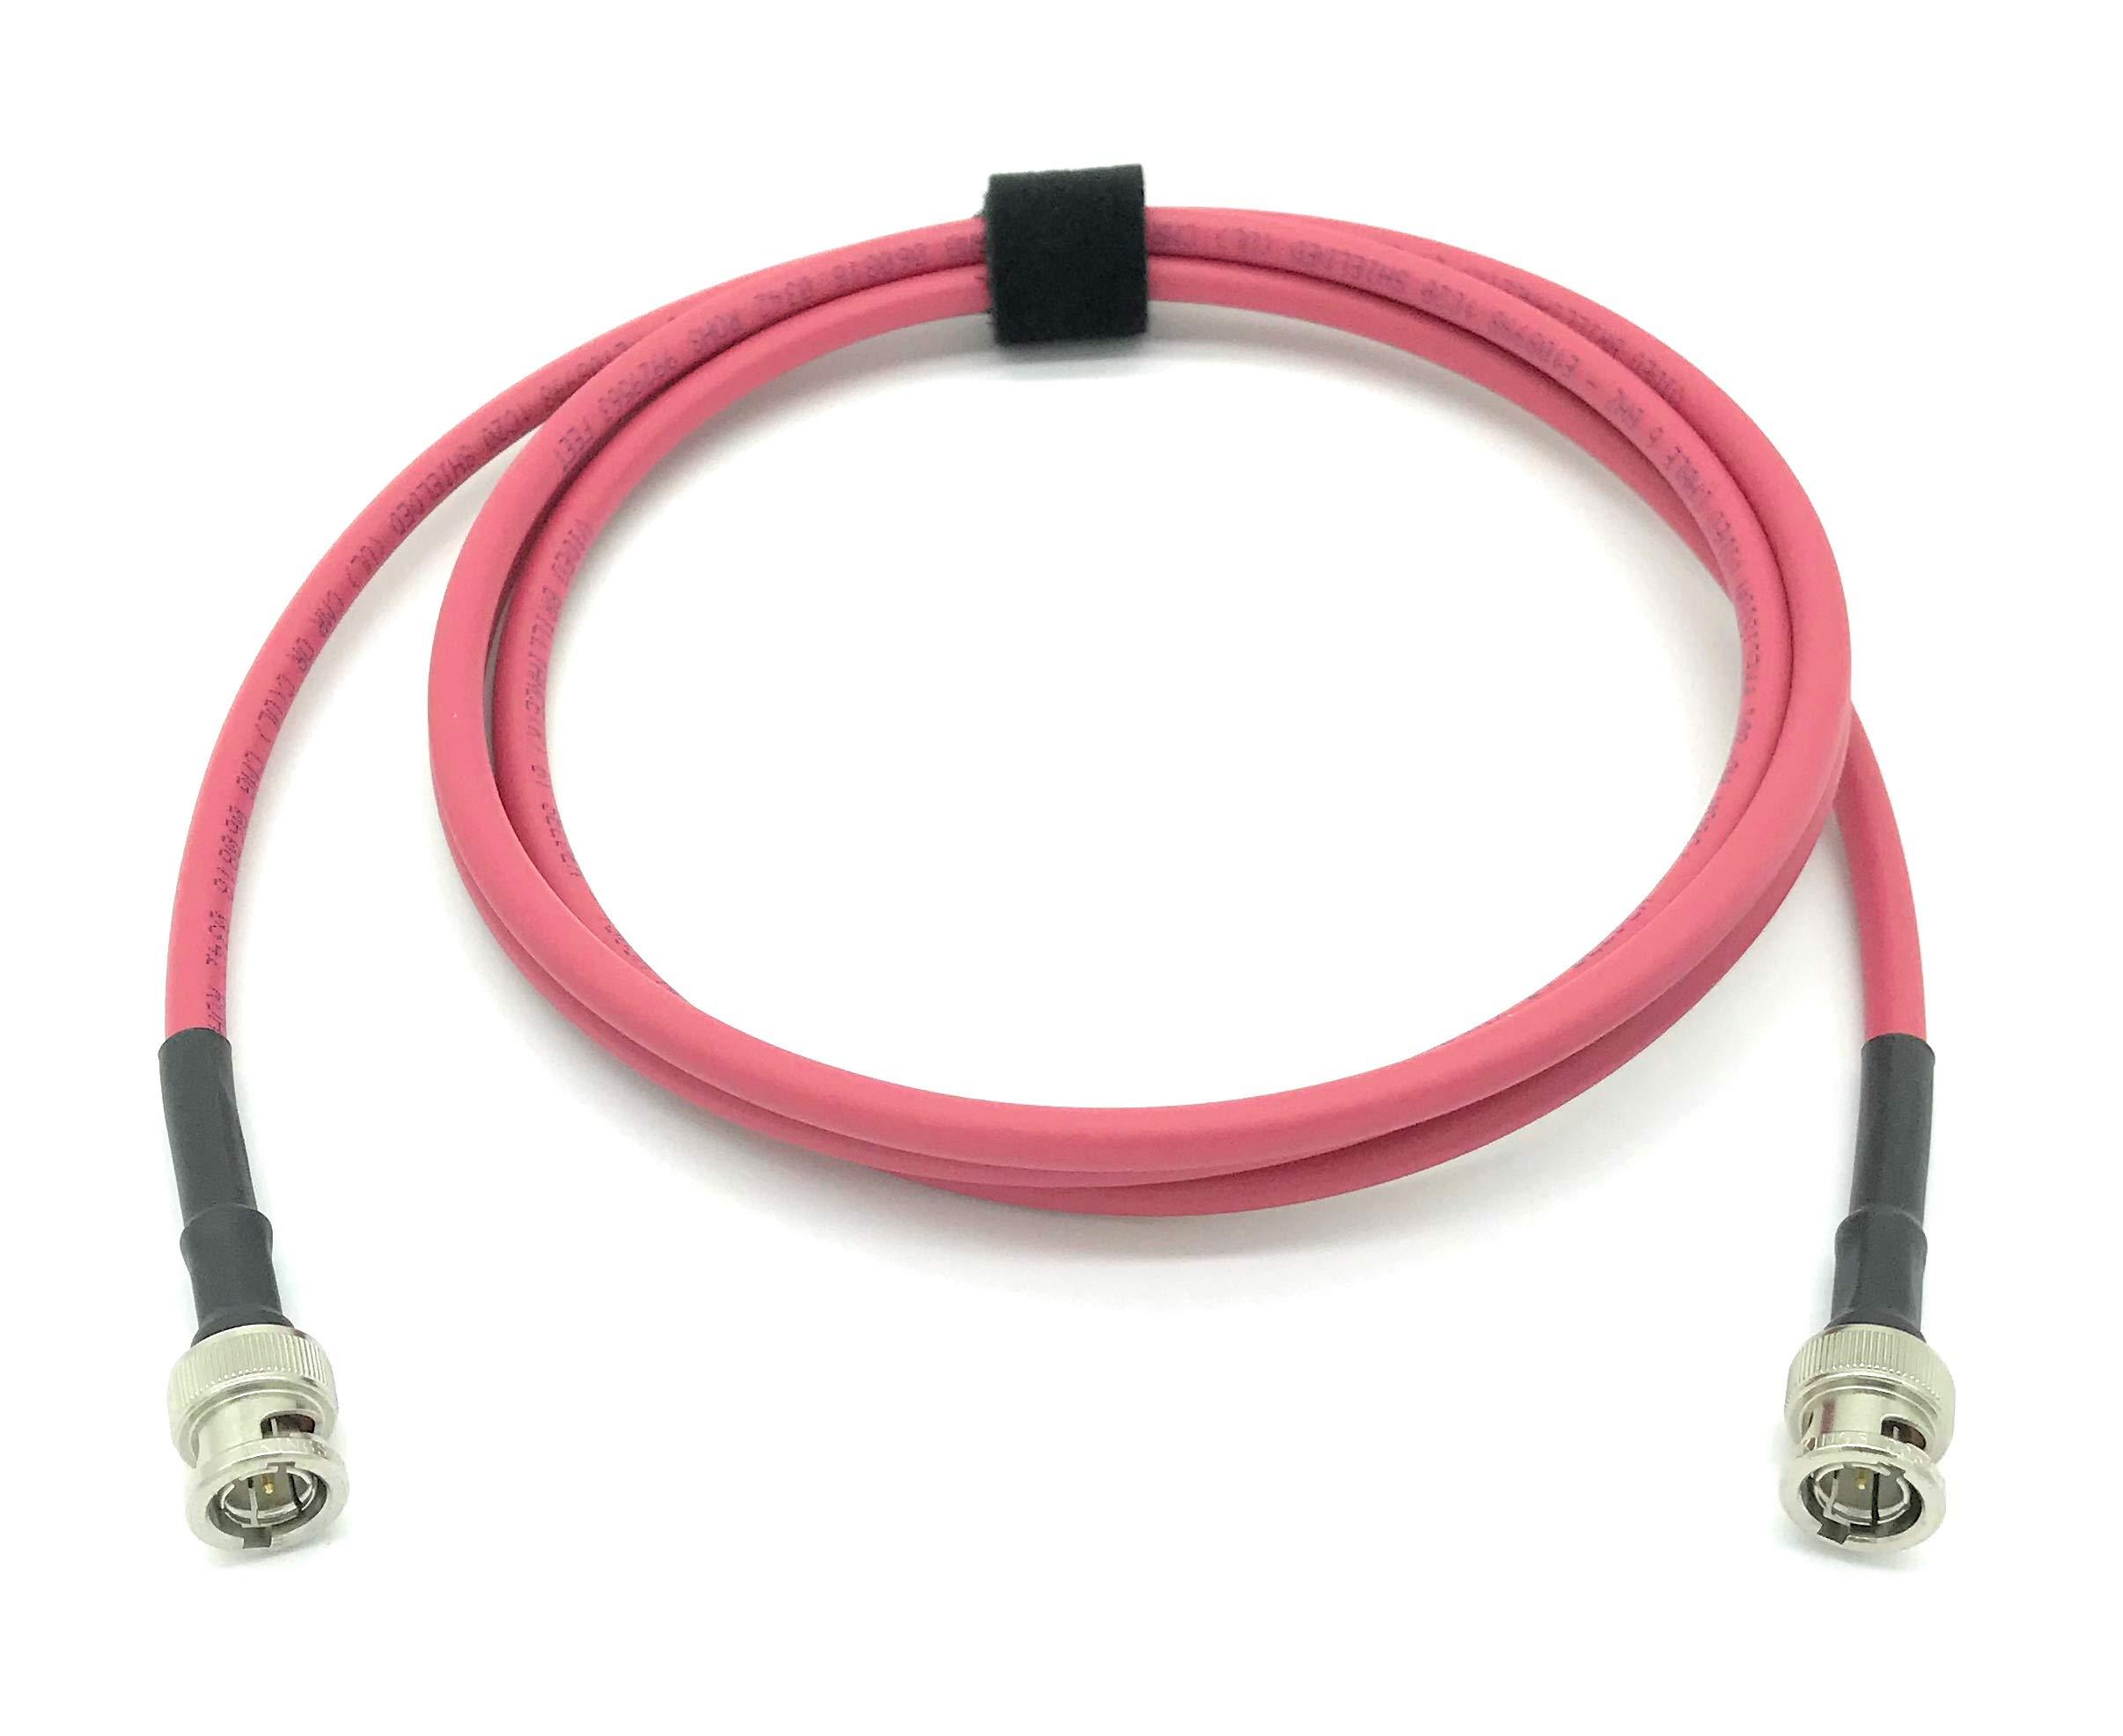 AV-Cables 3G/6G HD SDI BNC - BNC Cable Belden 1505A RG59 - Red (300ft)